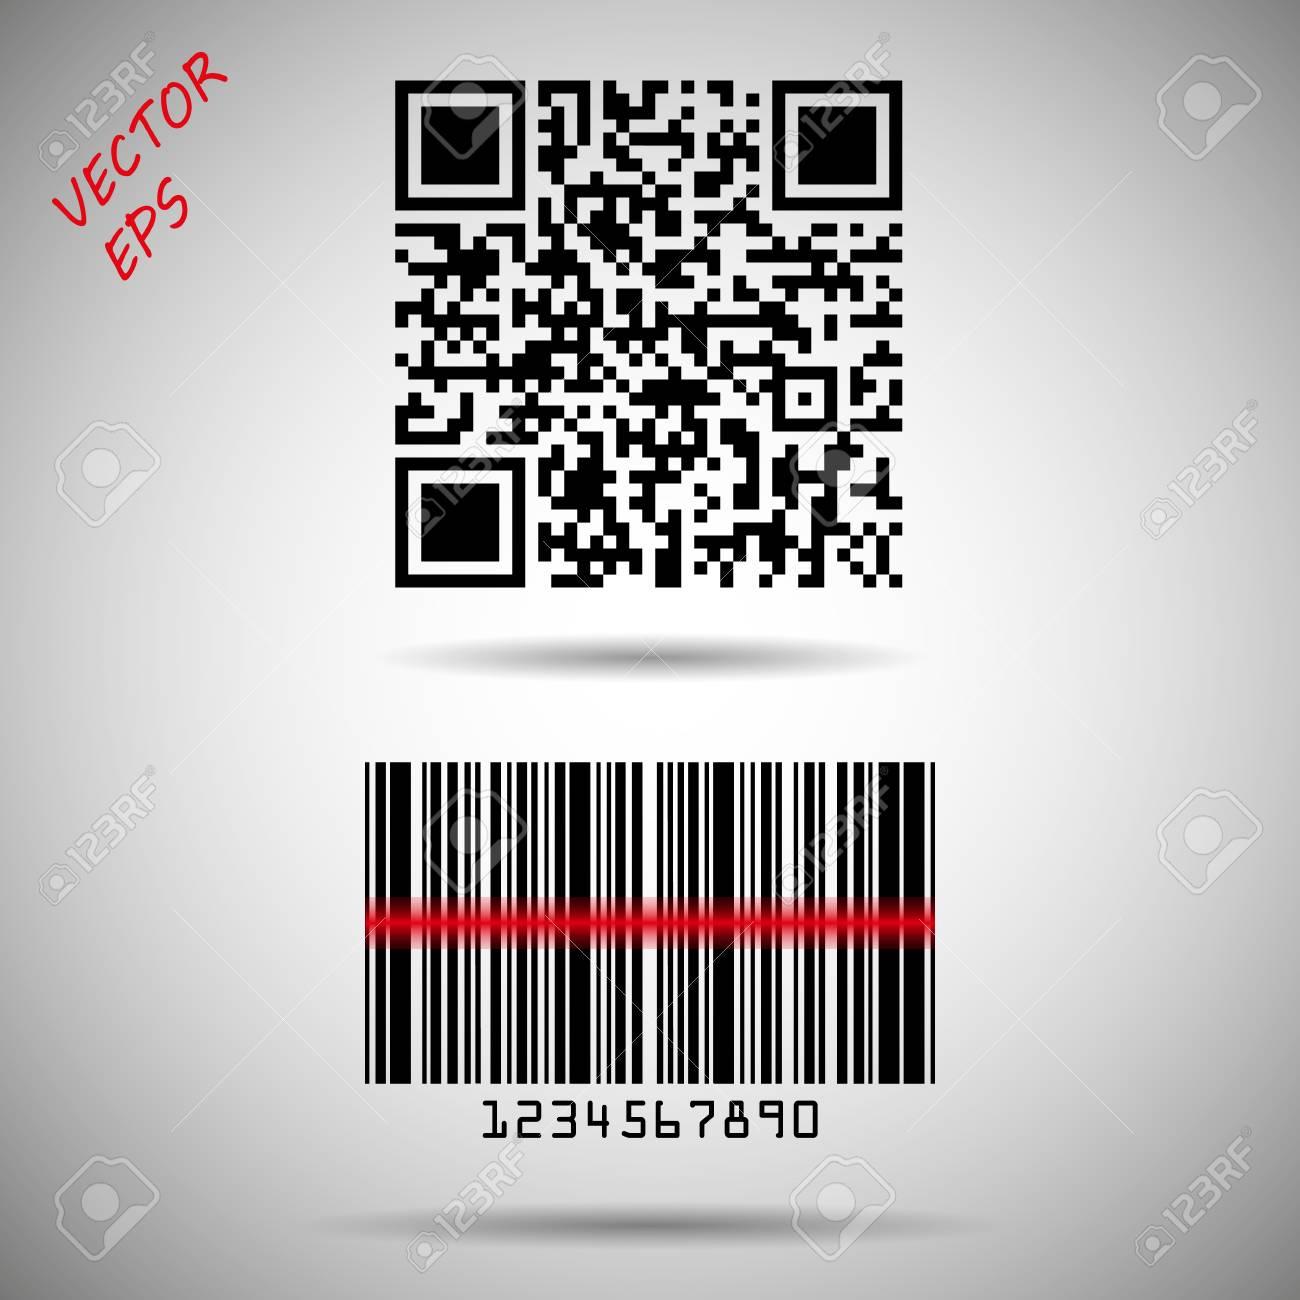 QR Code dating